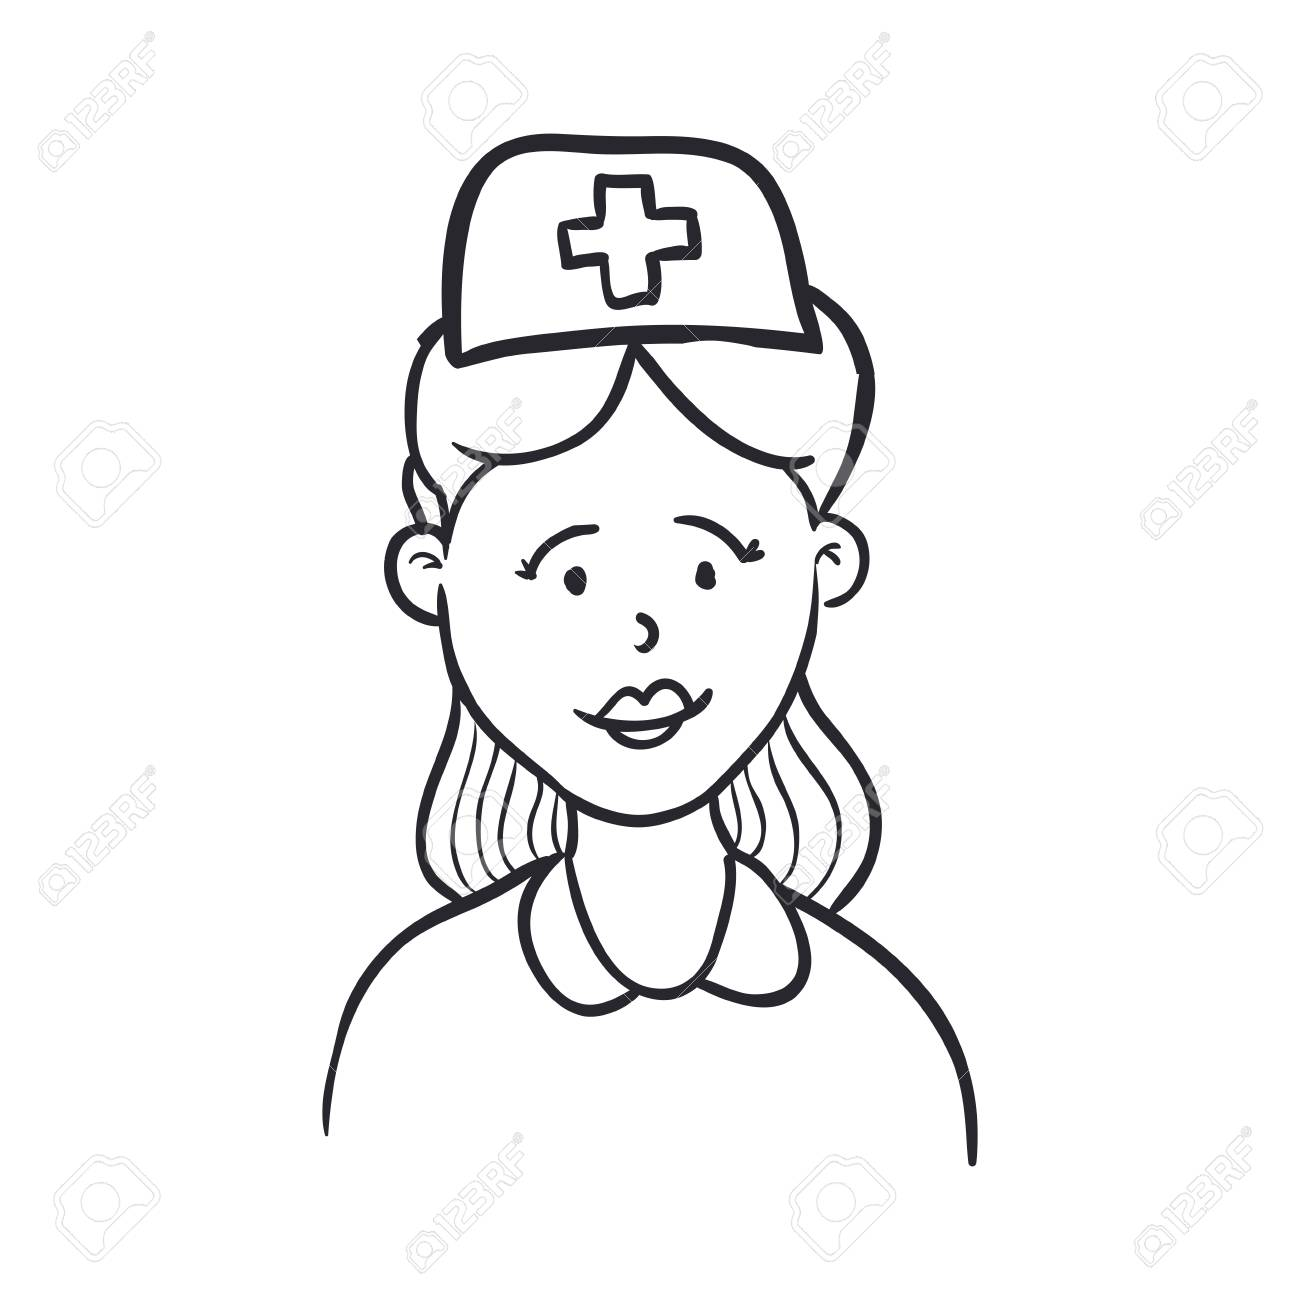 Nurse Cartoon Drawing At Getdrawings